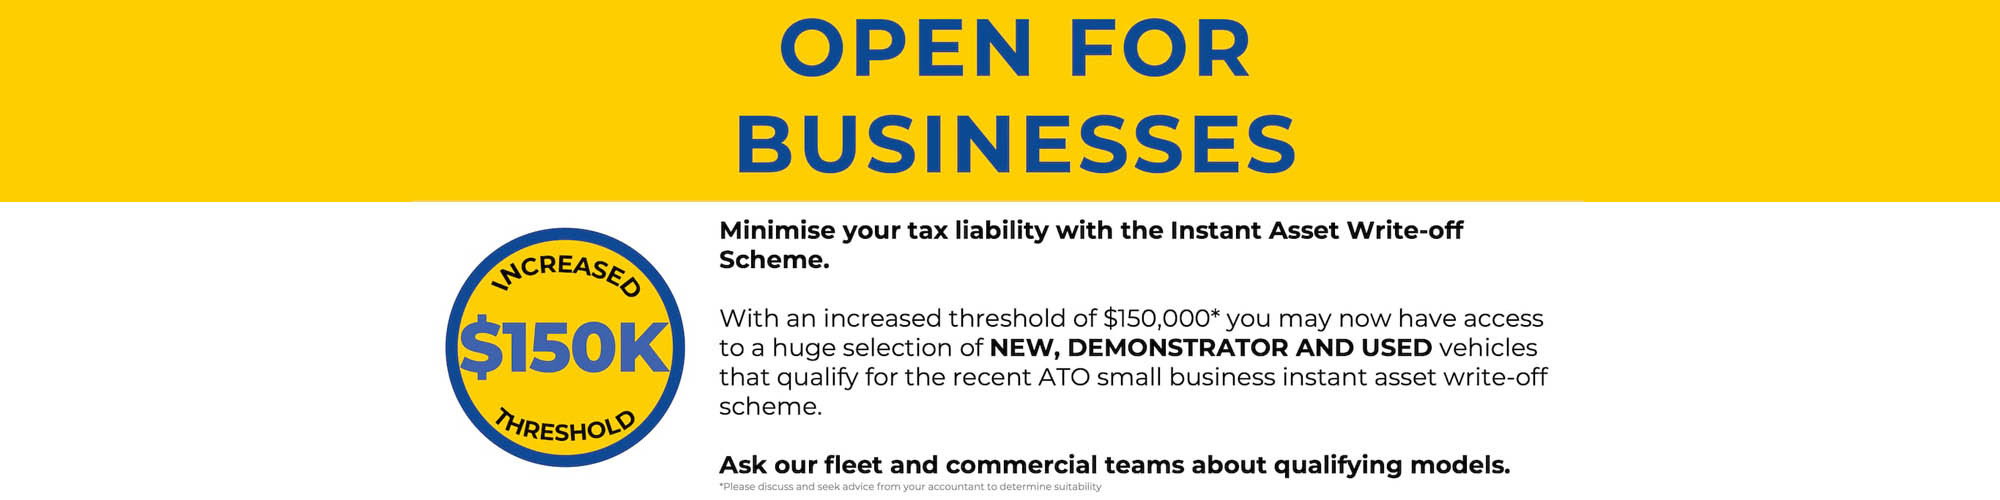 Fleet tax